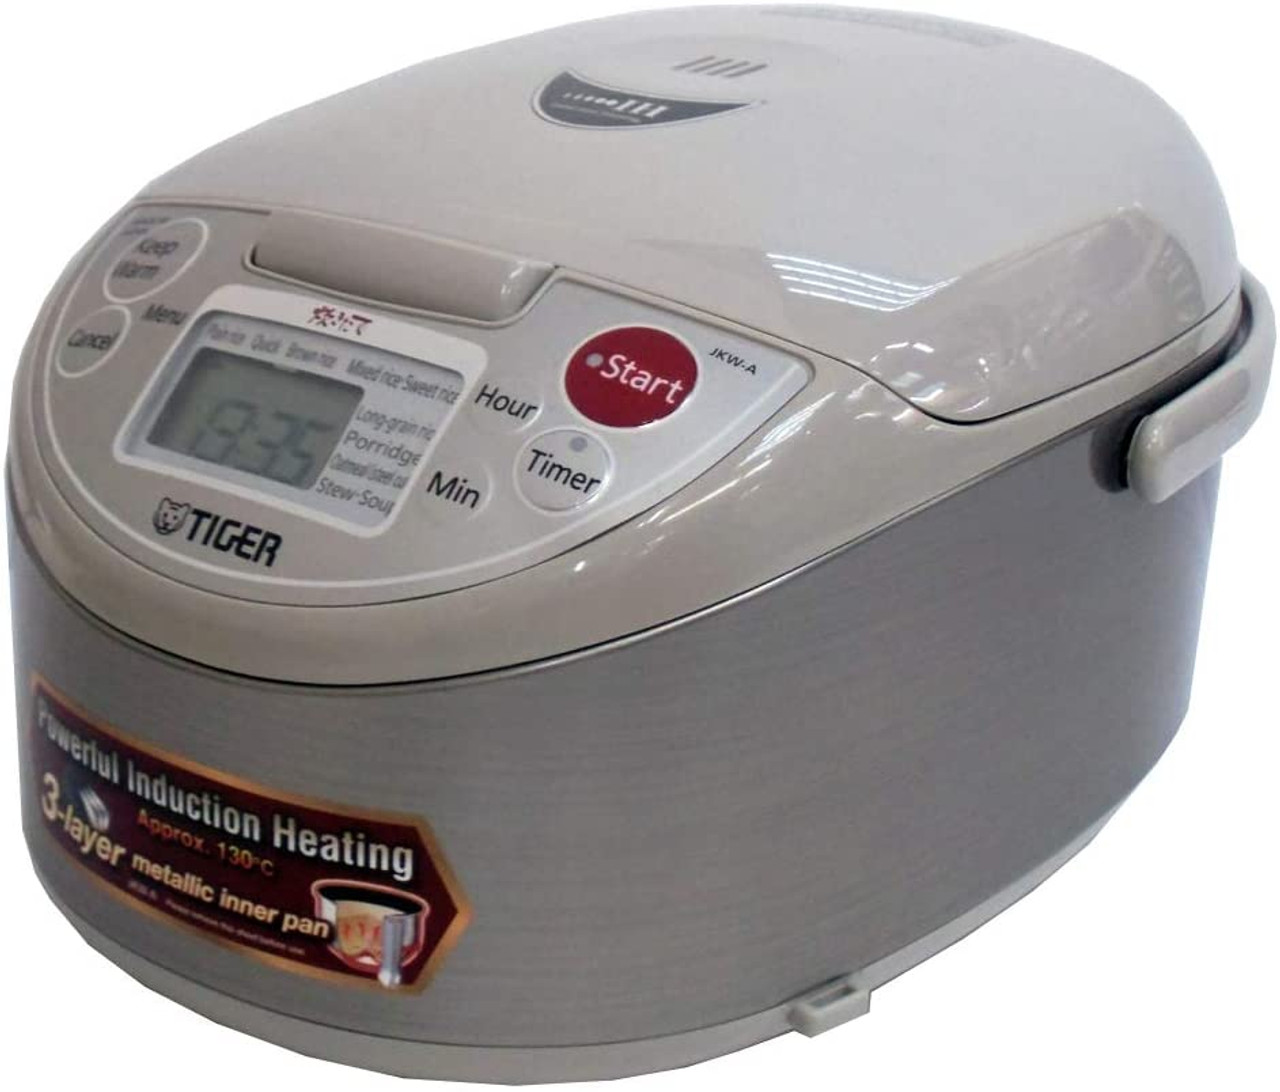 Tiger IH Rice Cooker 220v 1.8L (10 Cups) JKW-A18W